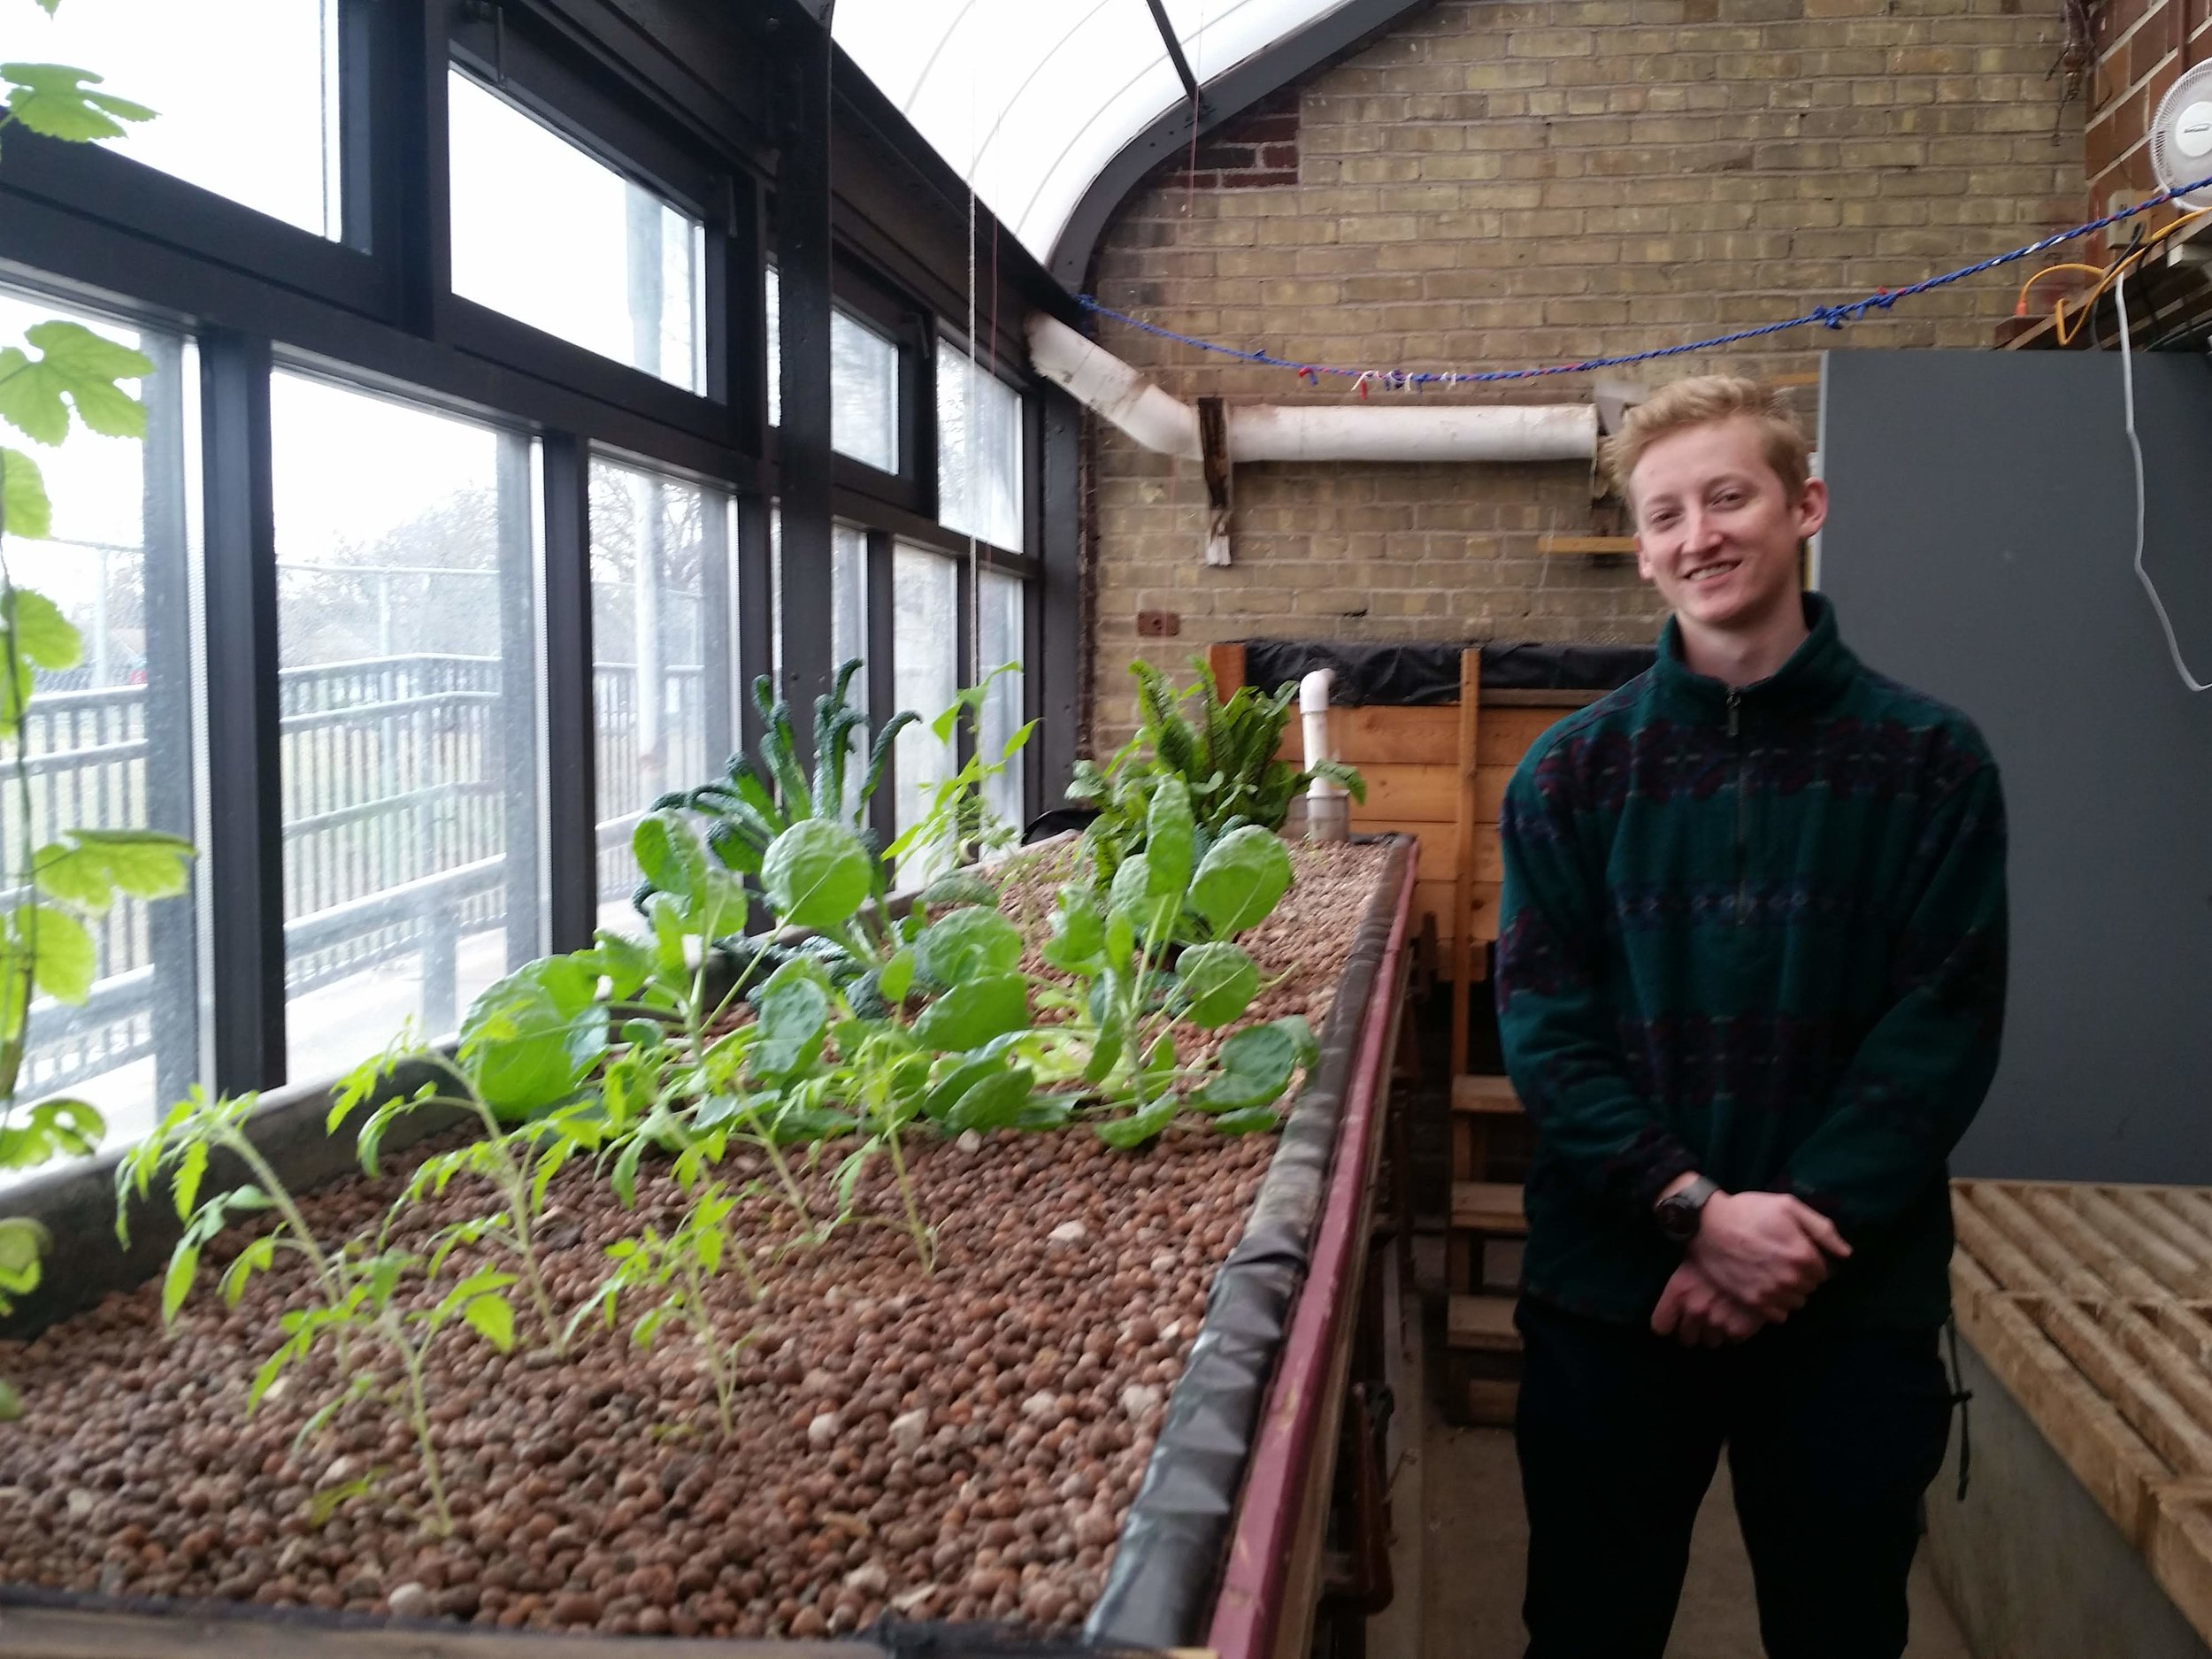 Matthew Kolasny at Roosevelt's indoor aquaponics system.